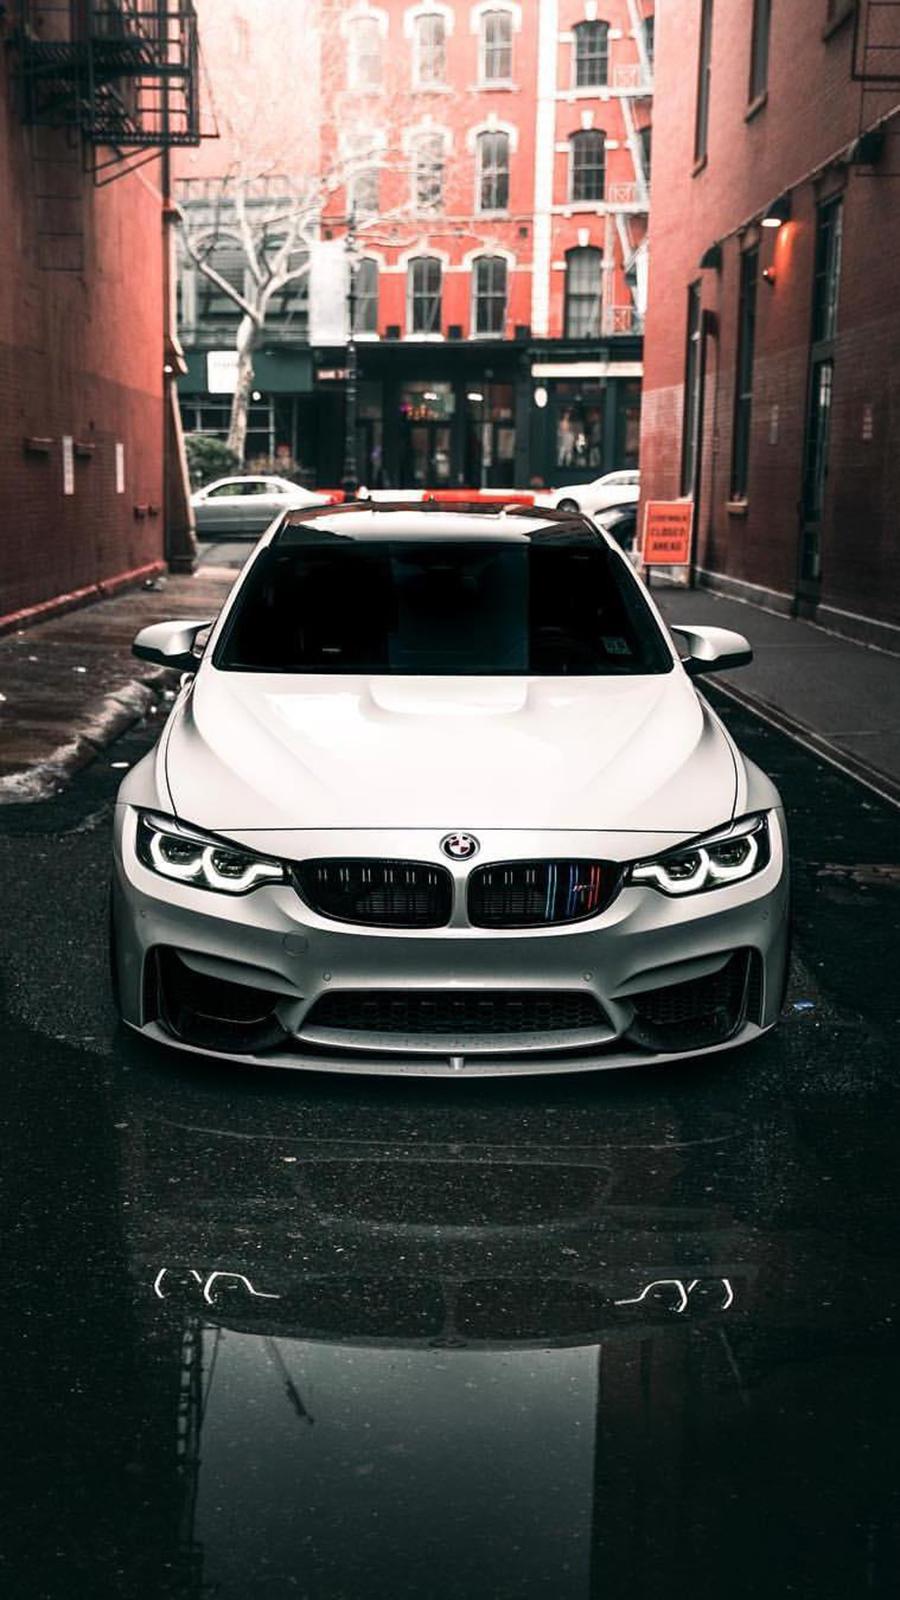 Best Bmw Wallpaper – Most Popular BMW Wallpapers Free Download